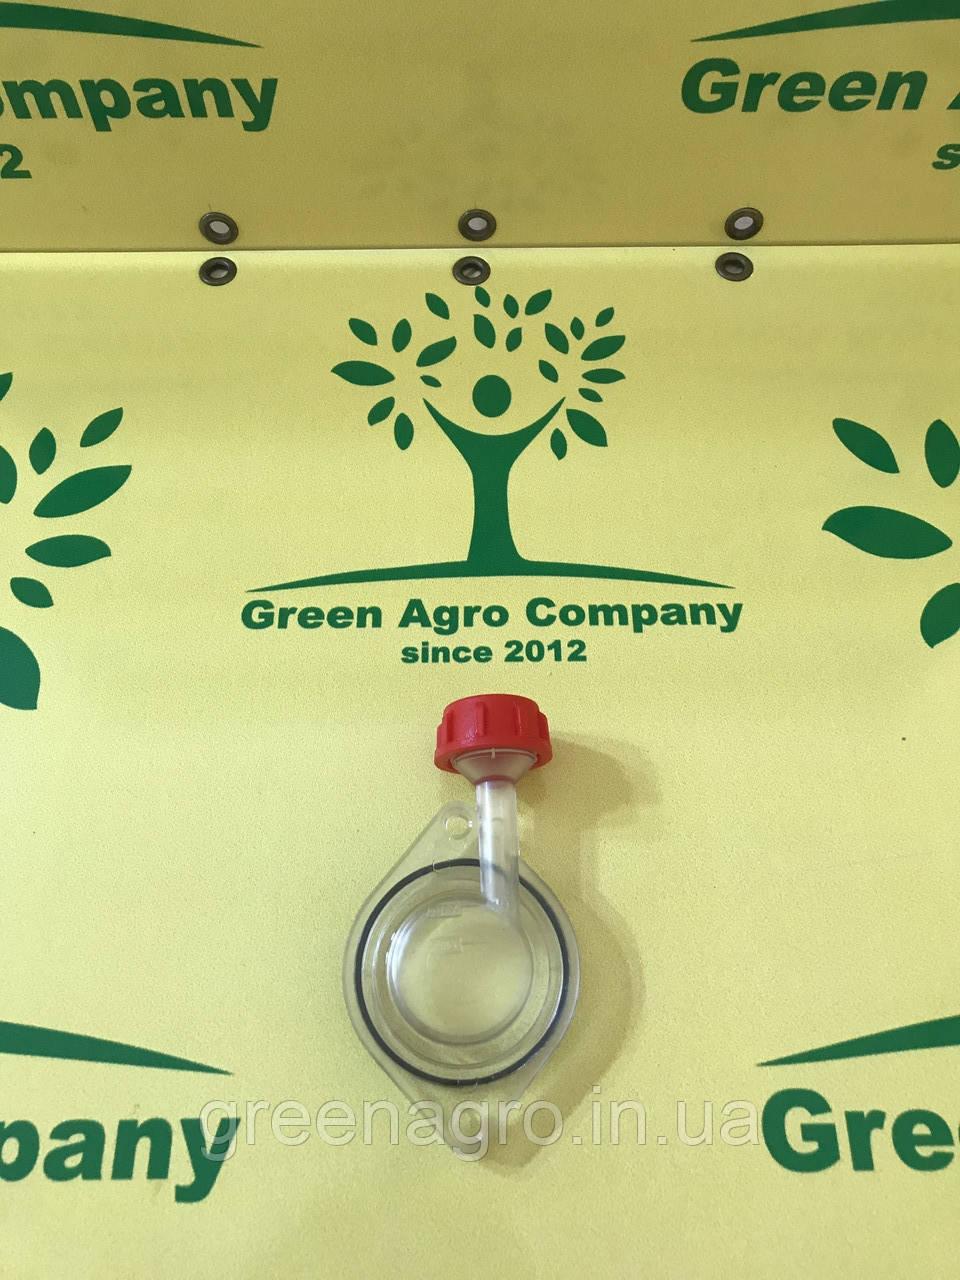 Масляний бак (покажчик рівня масла) насоса Agroplast на обприскувач.